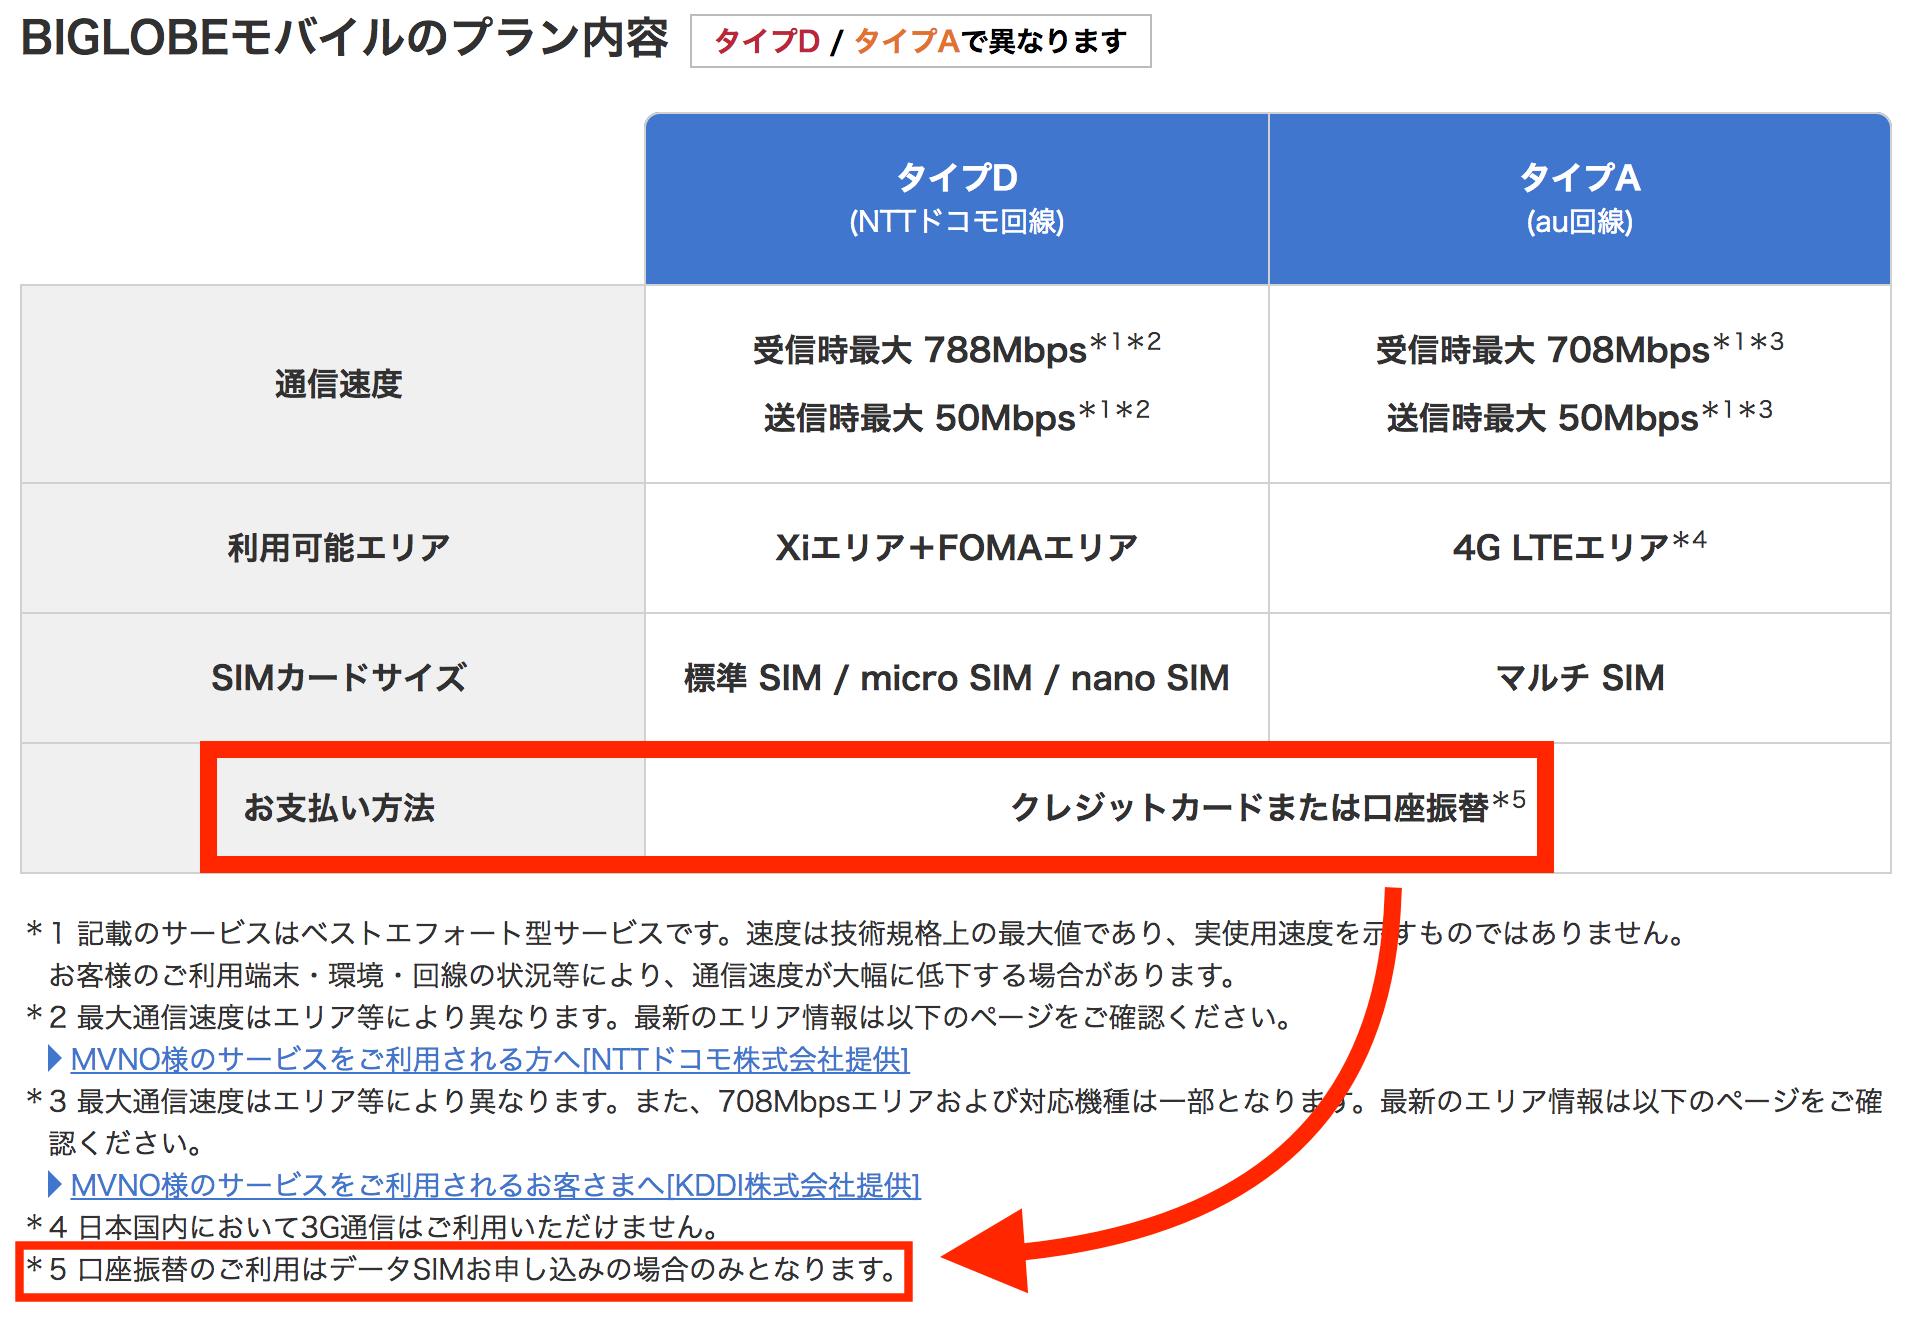 BIGLOBEモバイル口座振替はデータSIMしか口座振替できない!